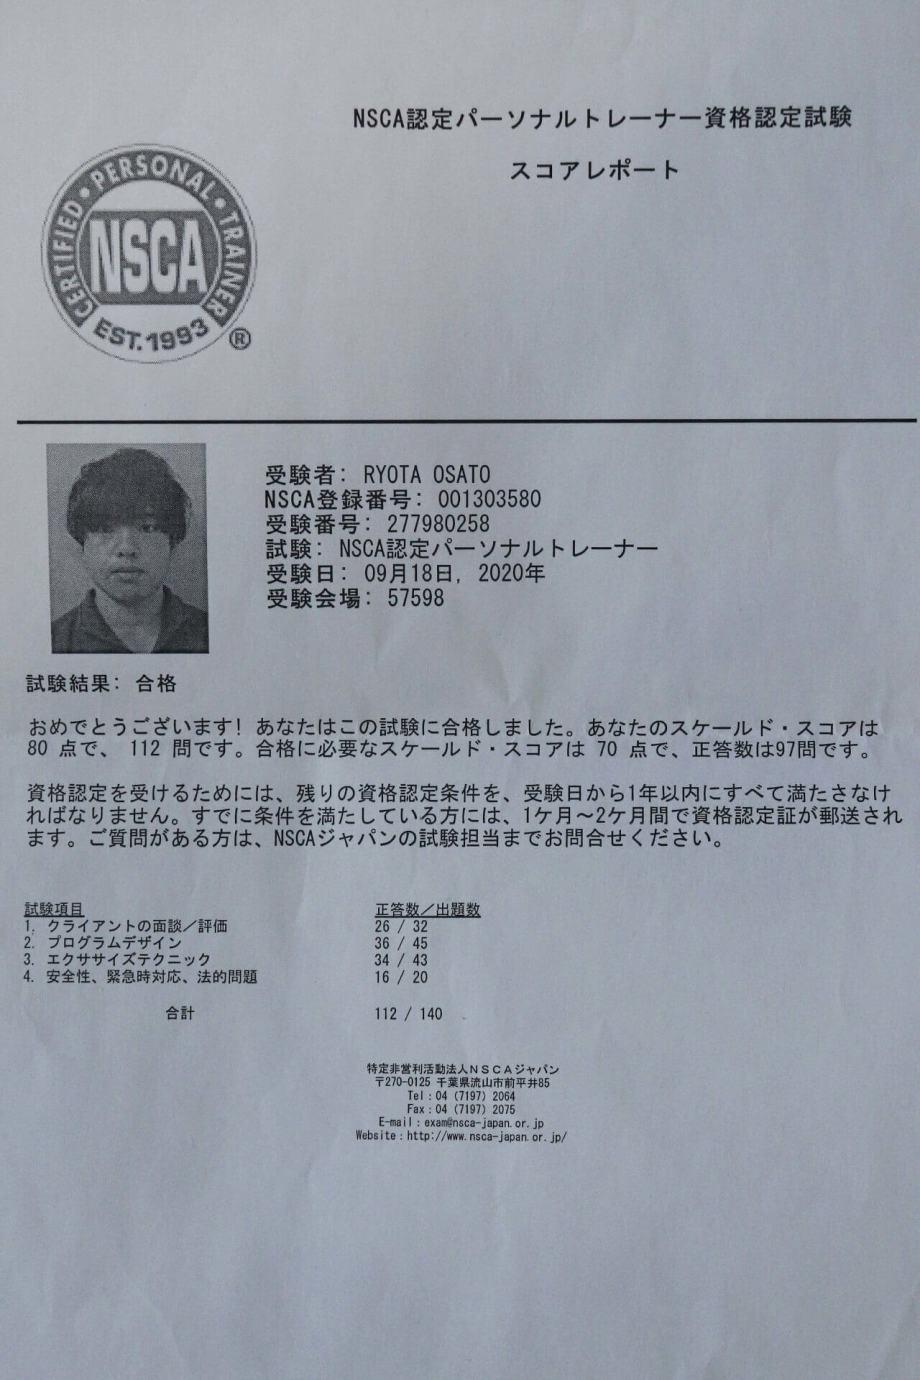 NSCA-CPTスコアレポート